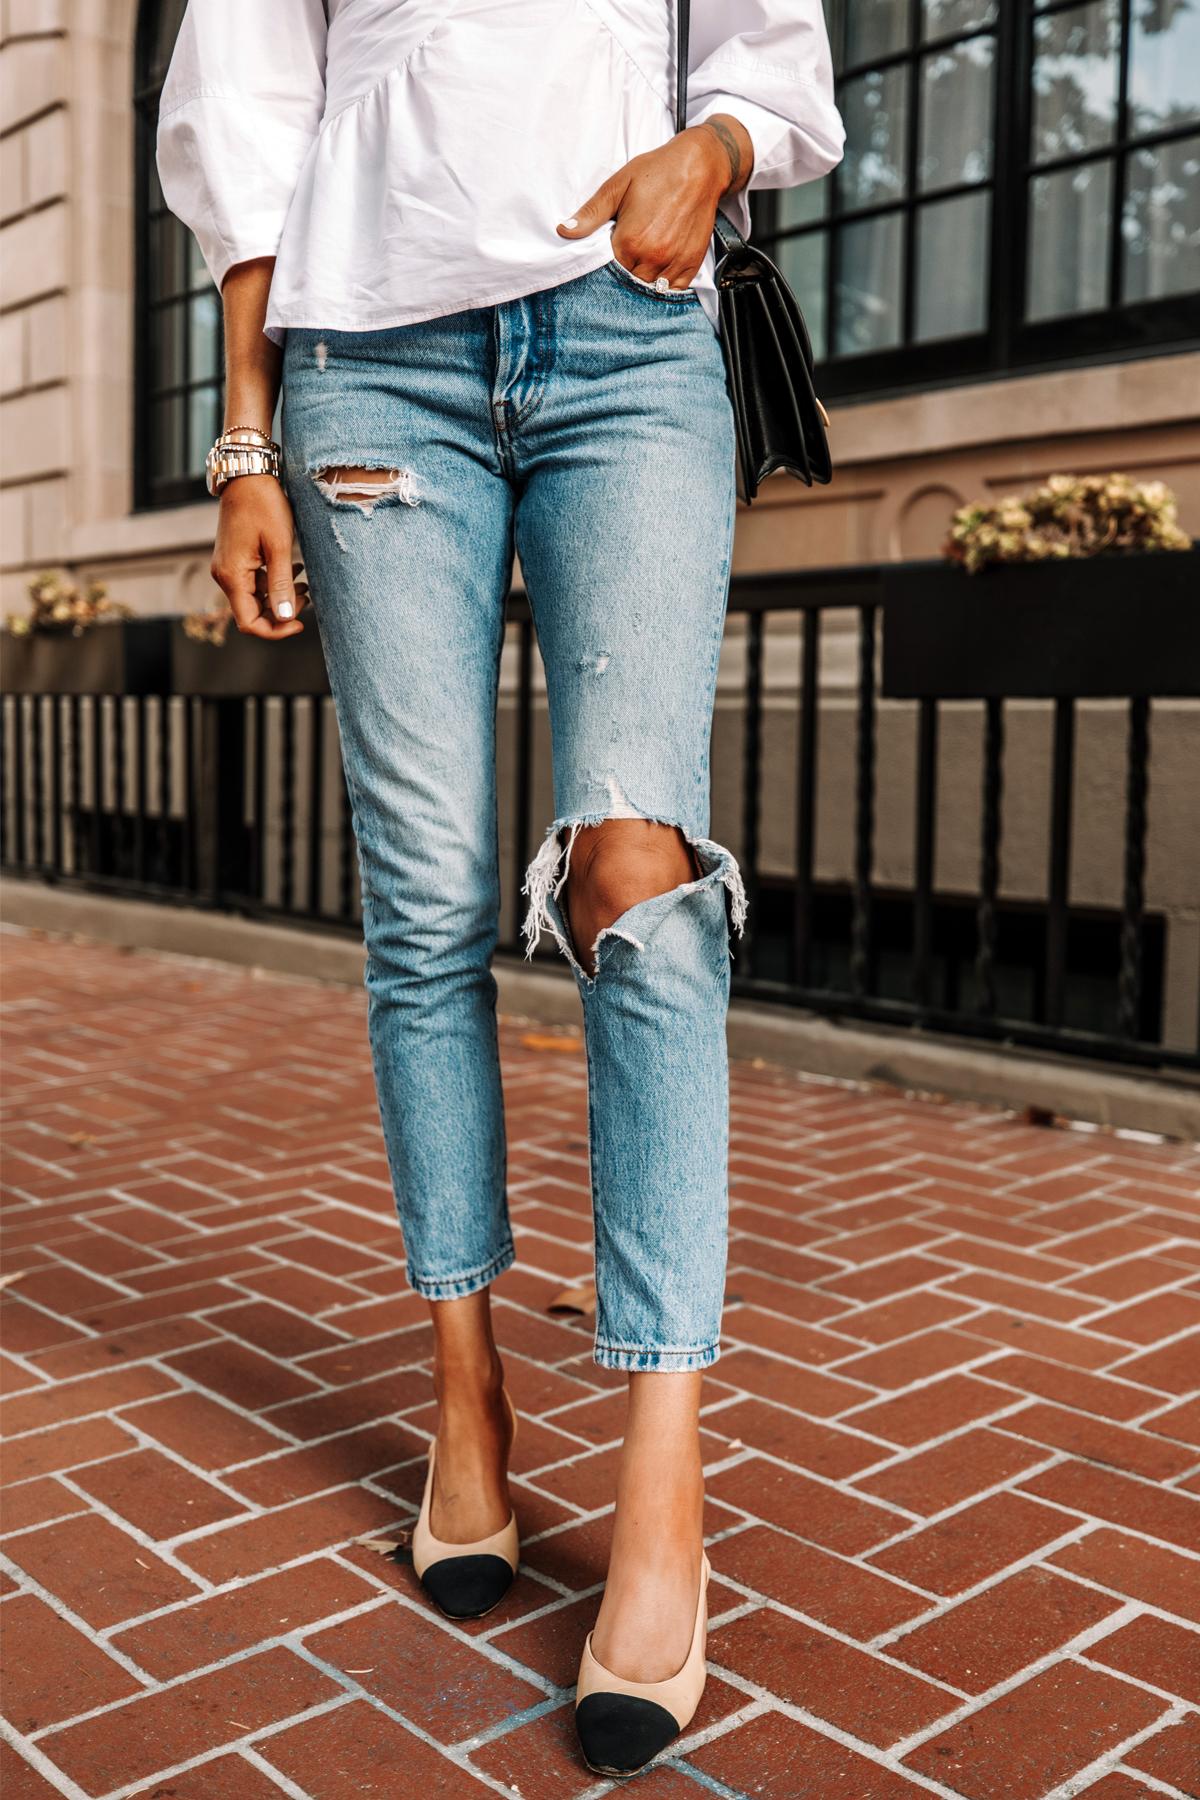 Fashion Jackson Wearing White Blouse Levis 501 Skinny Ripped Jeans Chanel Slingbacks